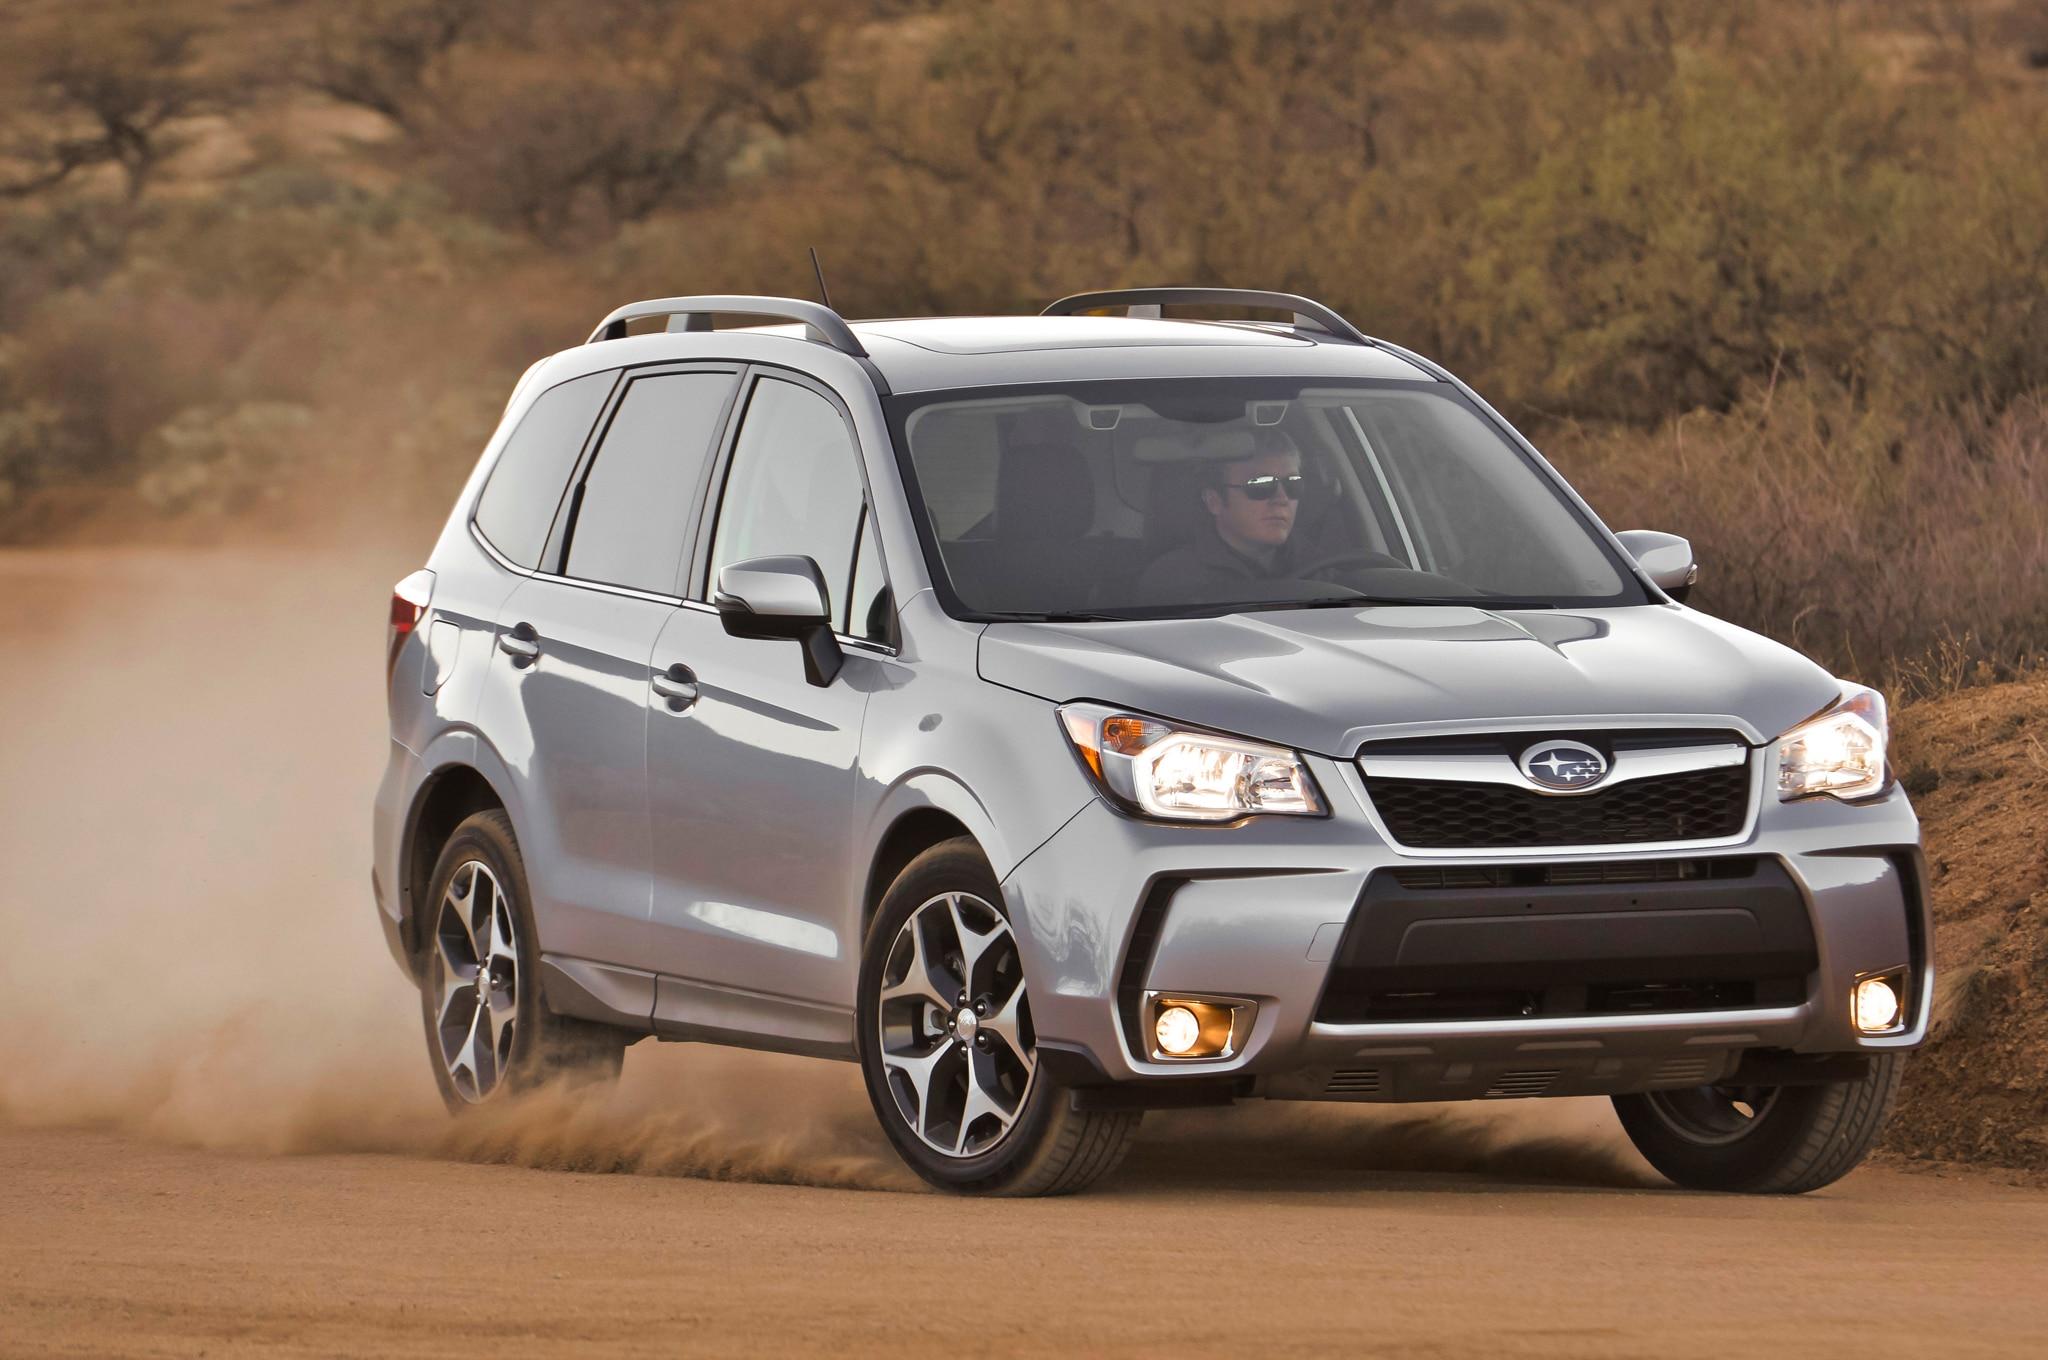 First Drive: 2014 Subaru Forester - Automobile Magazine